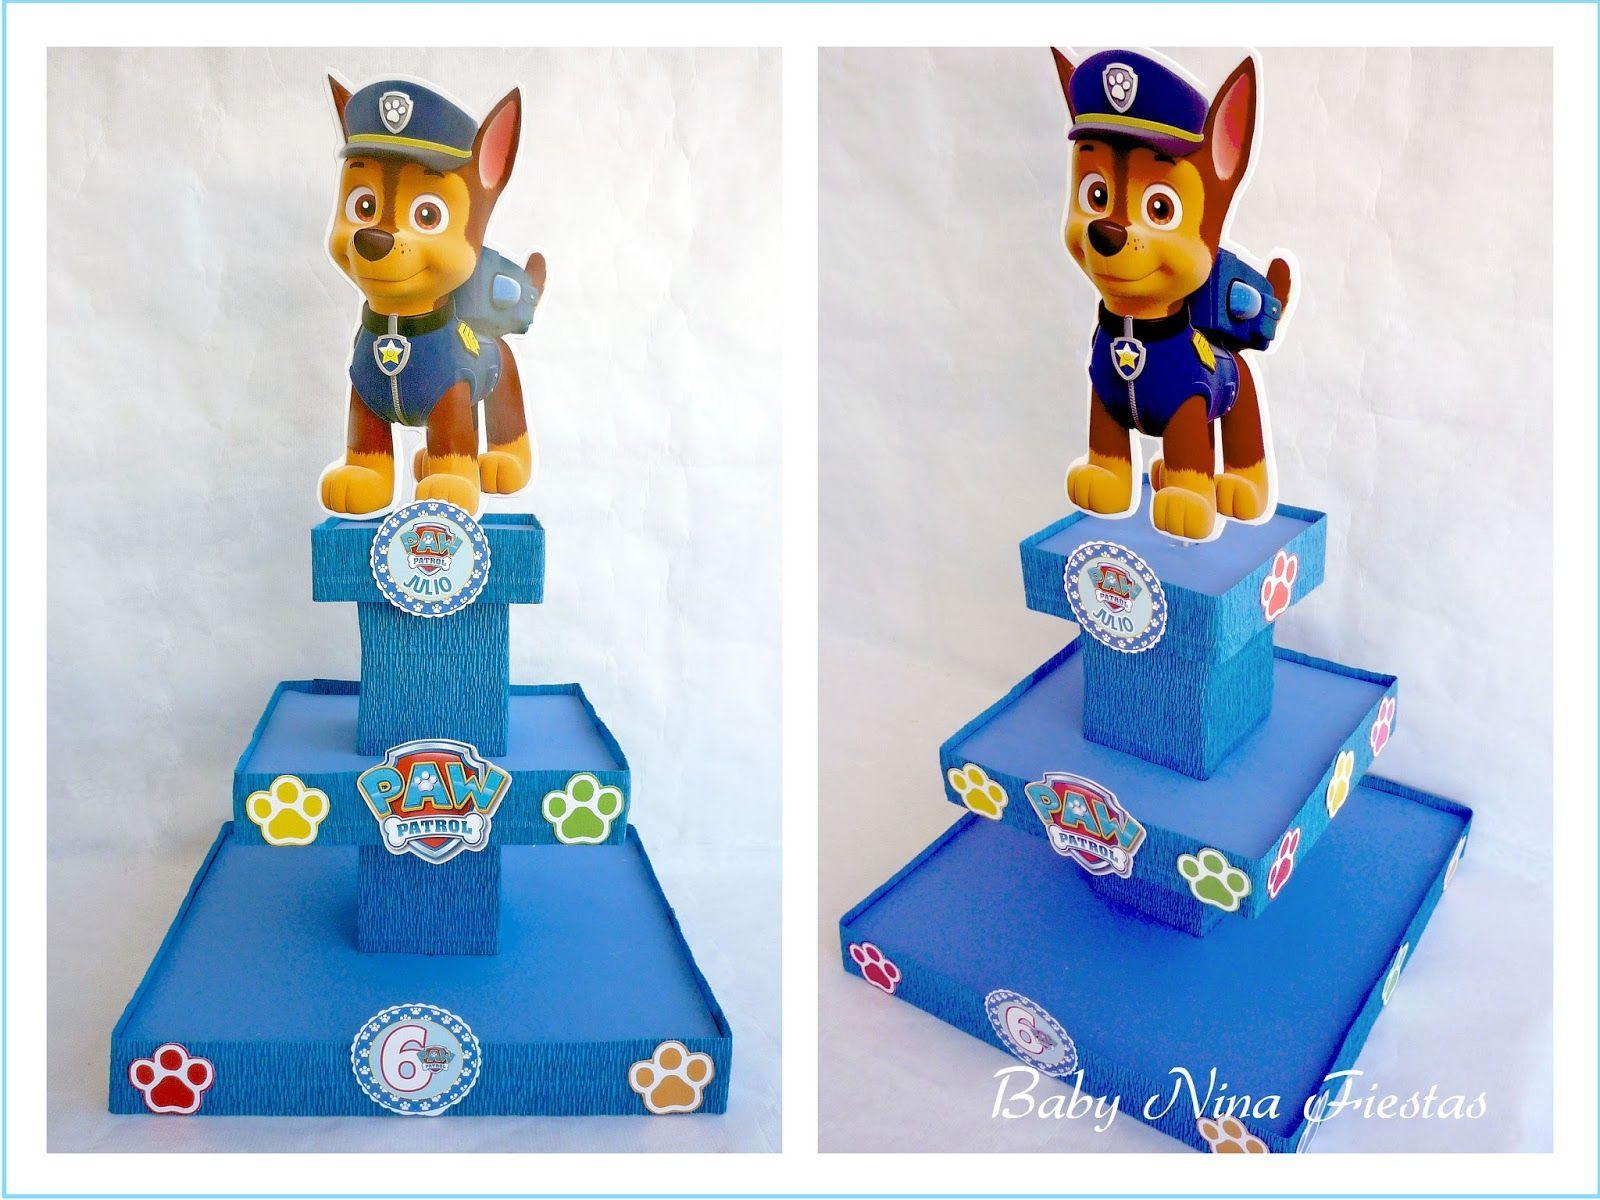 Kit cumplea os patrulla canina patrulla de cachorros - Manualidades patrulla canina ...